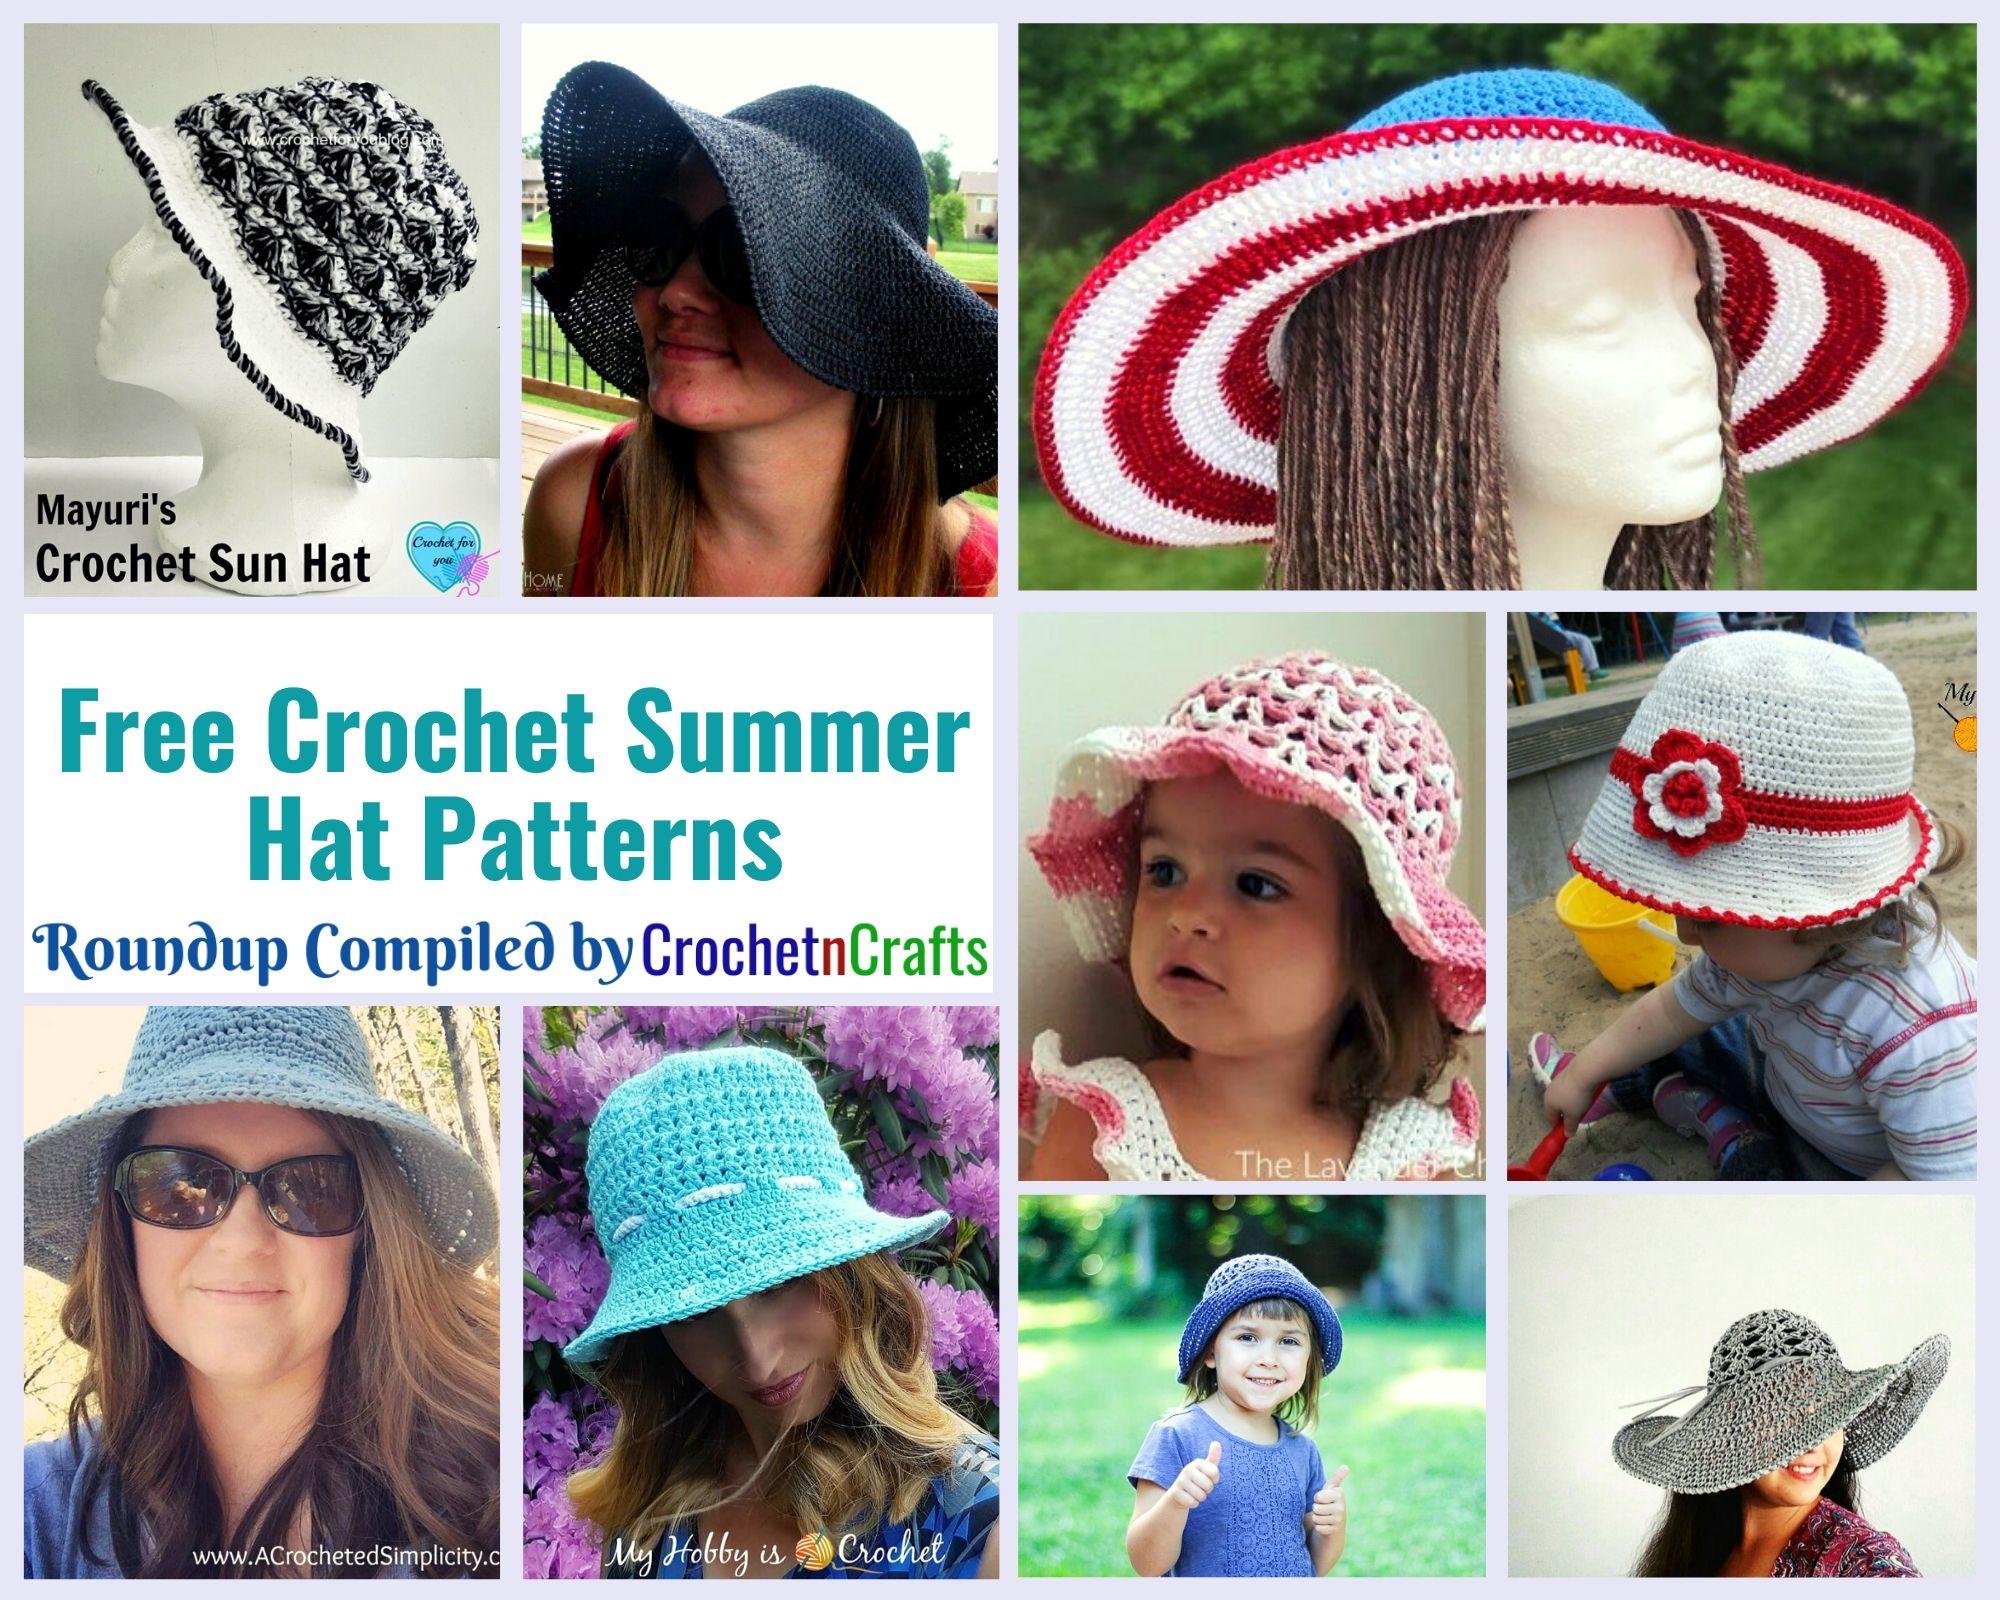 Free Crochet Summer Hat Patterns Crochetncrafts